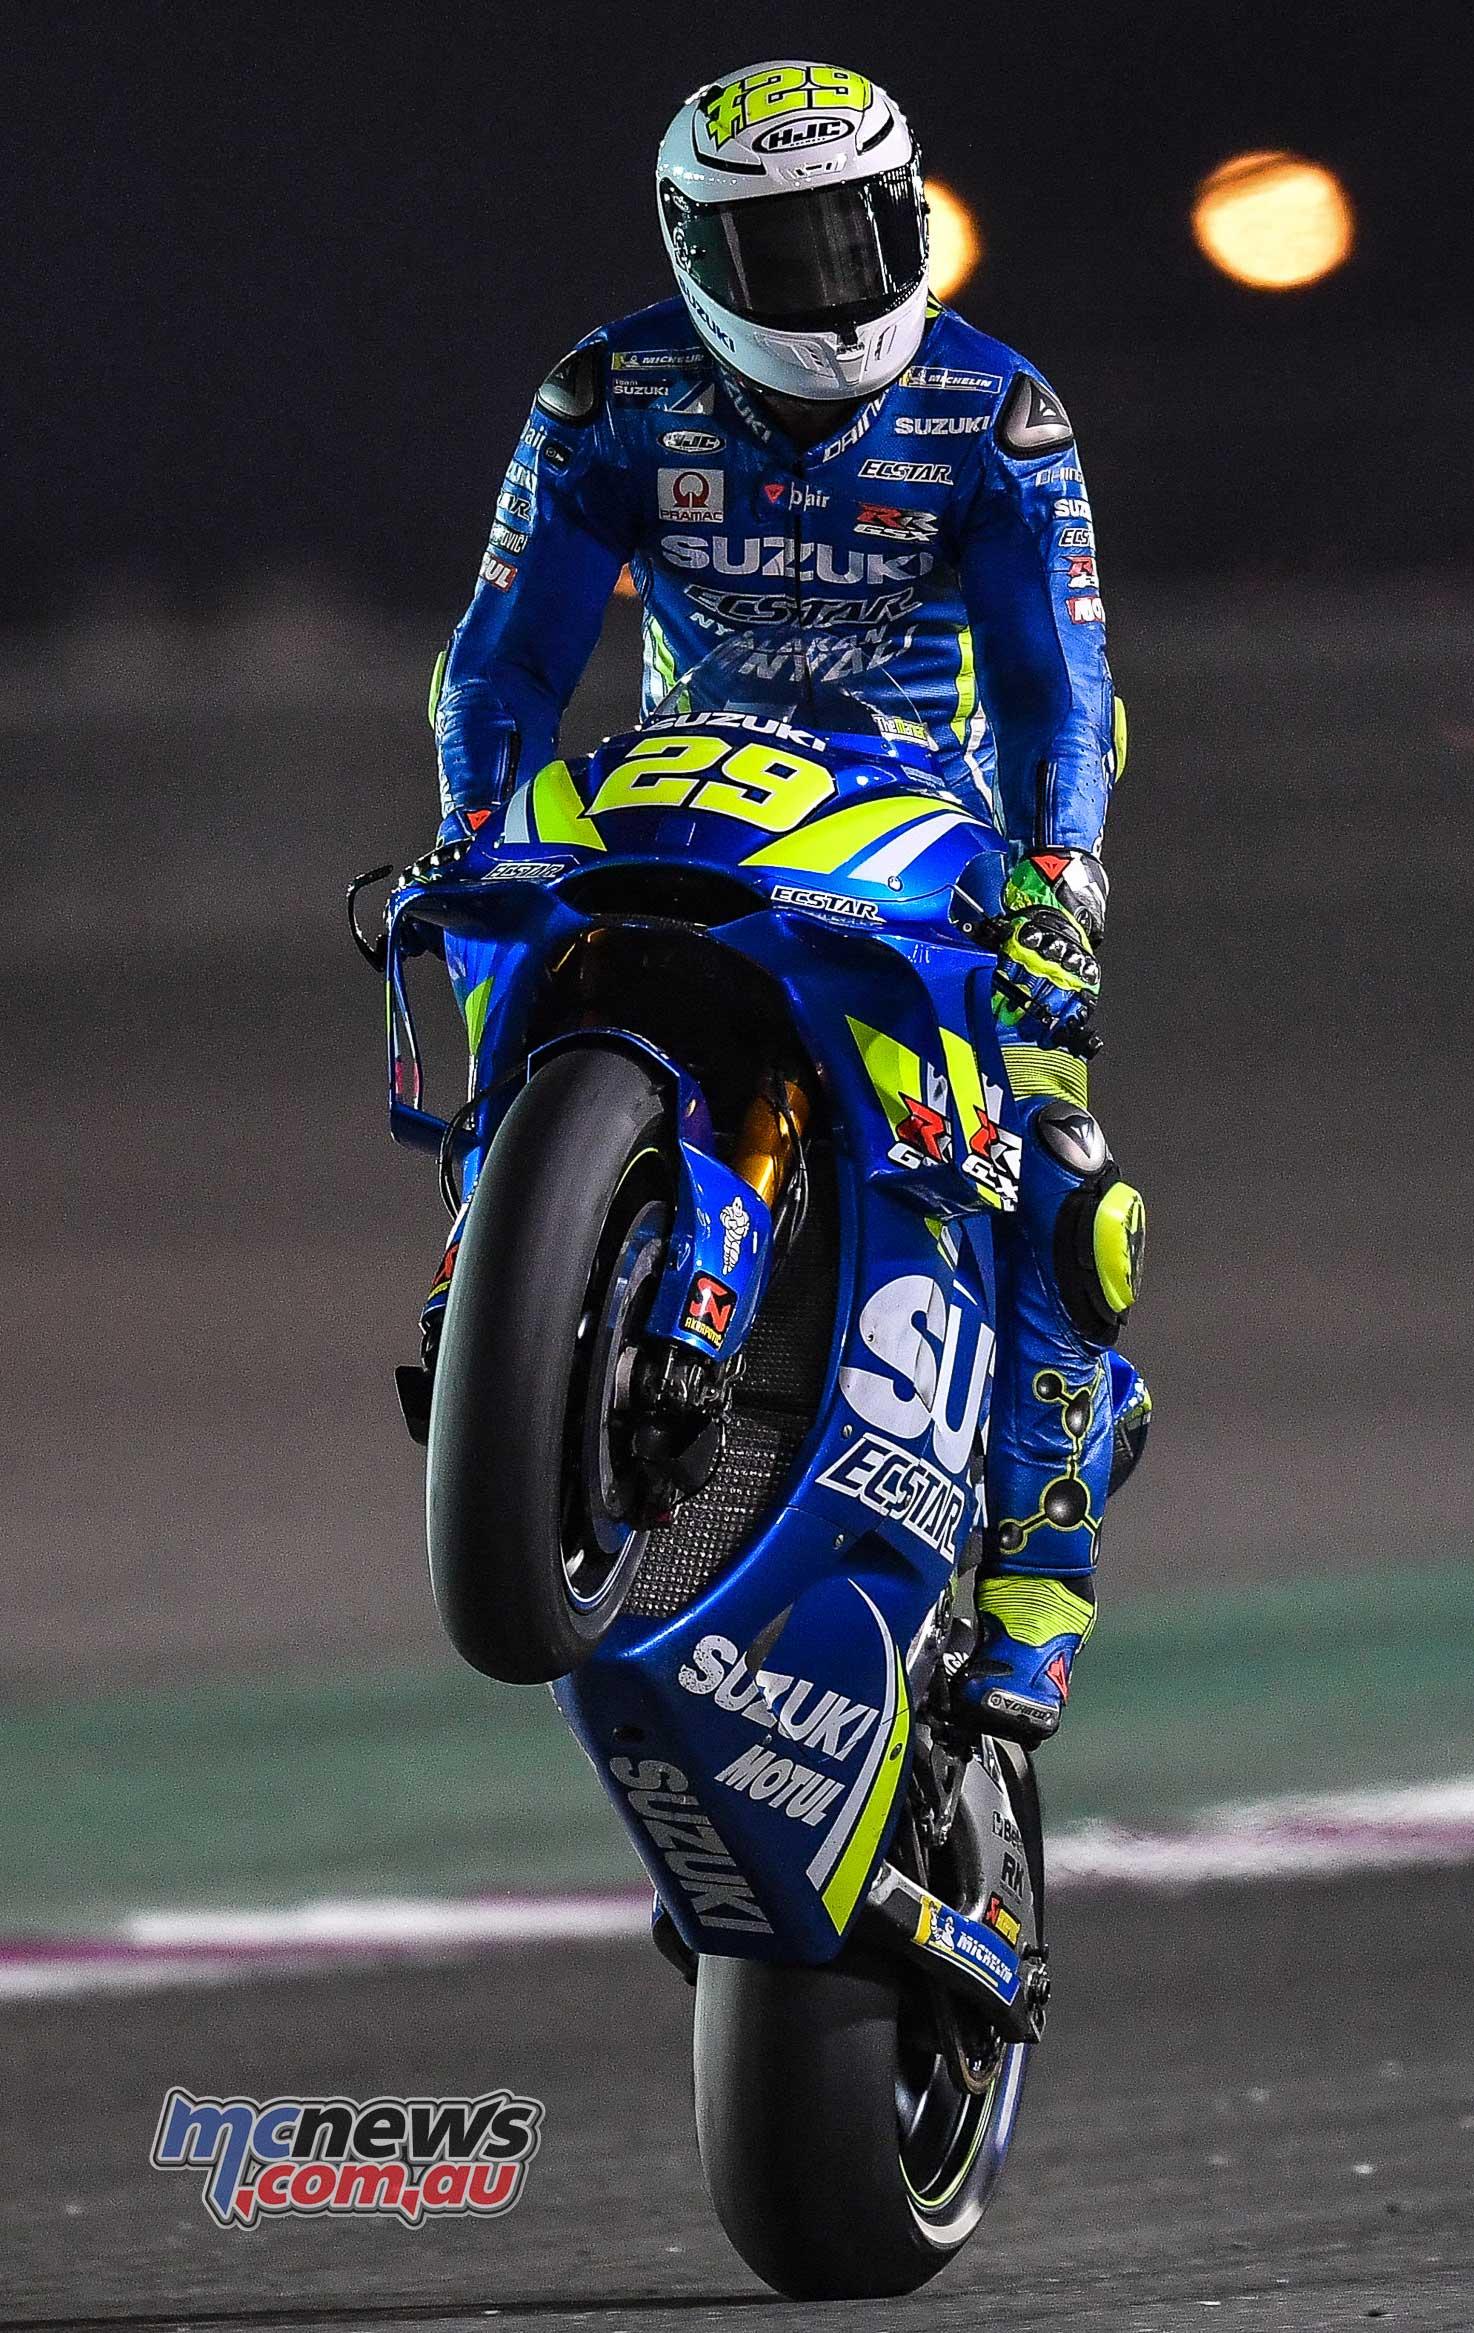 Suzuki top second day of MotoGP #QatarTest at Losail | MCNews.com.au